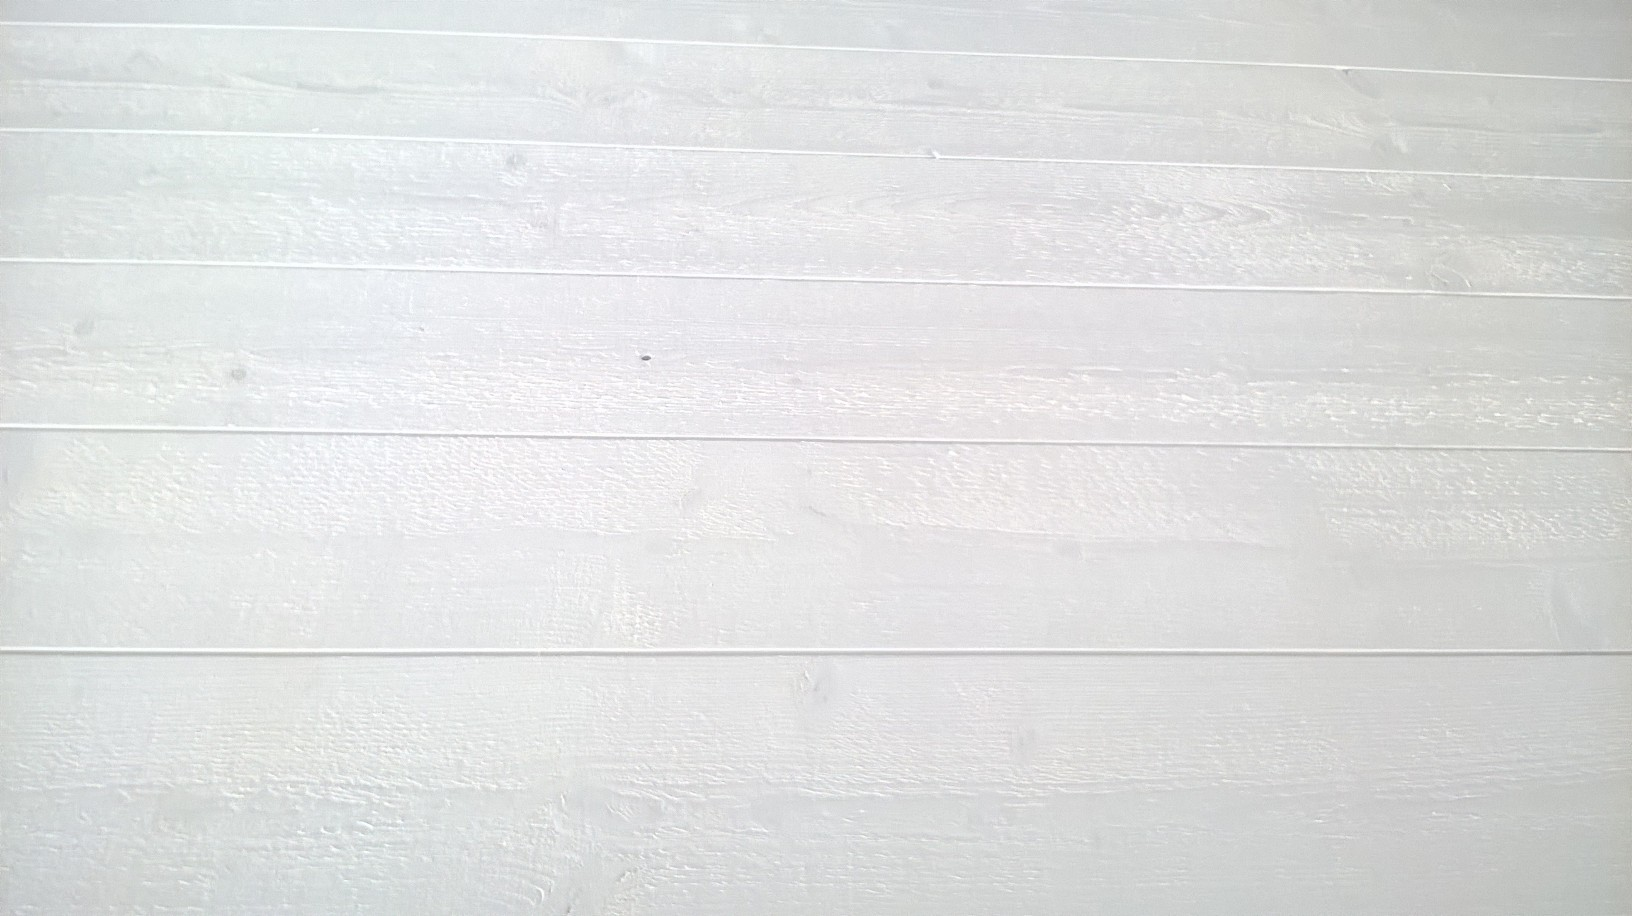 fichte rustikal s geschnitt innenausbau wei nut feder 14x146 mm. Black Bedroom Furniture Sets. Home Design Ideas